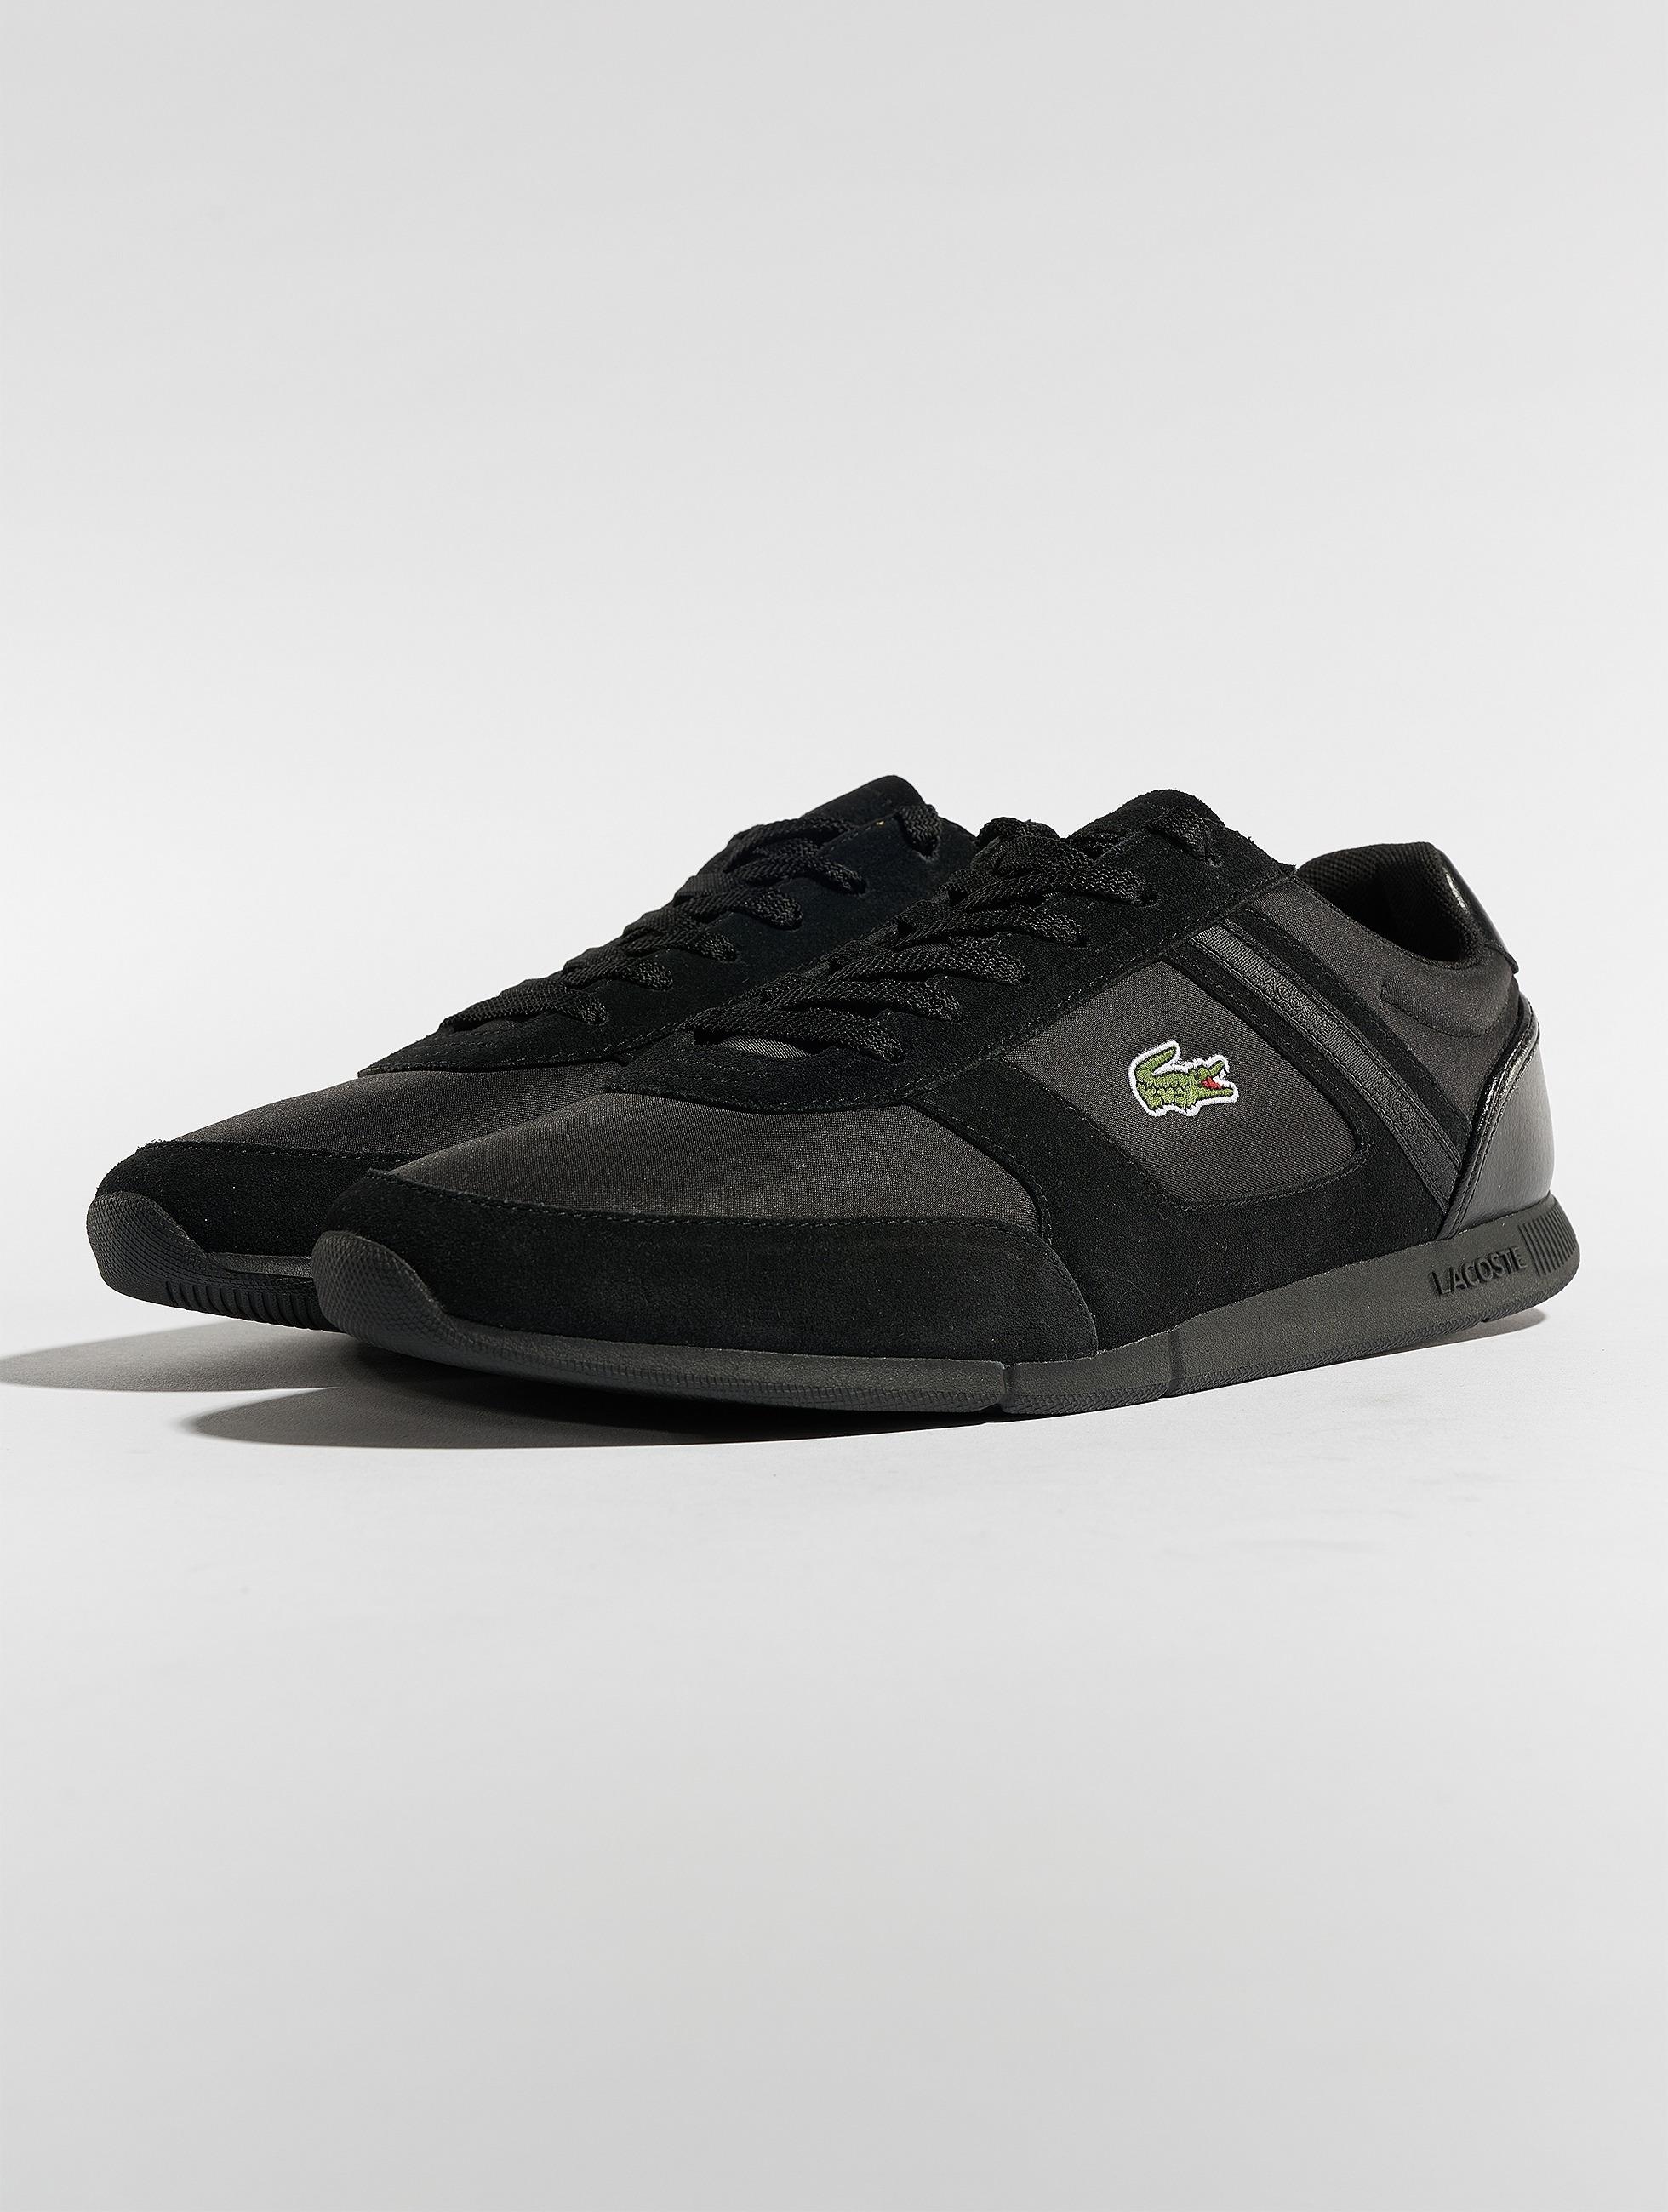 Cam Sport Blackred 1 Sneakers Lacoste Menerva 318 tCxsQhrd